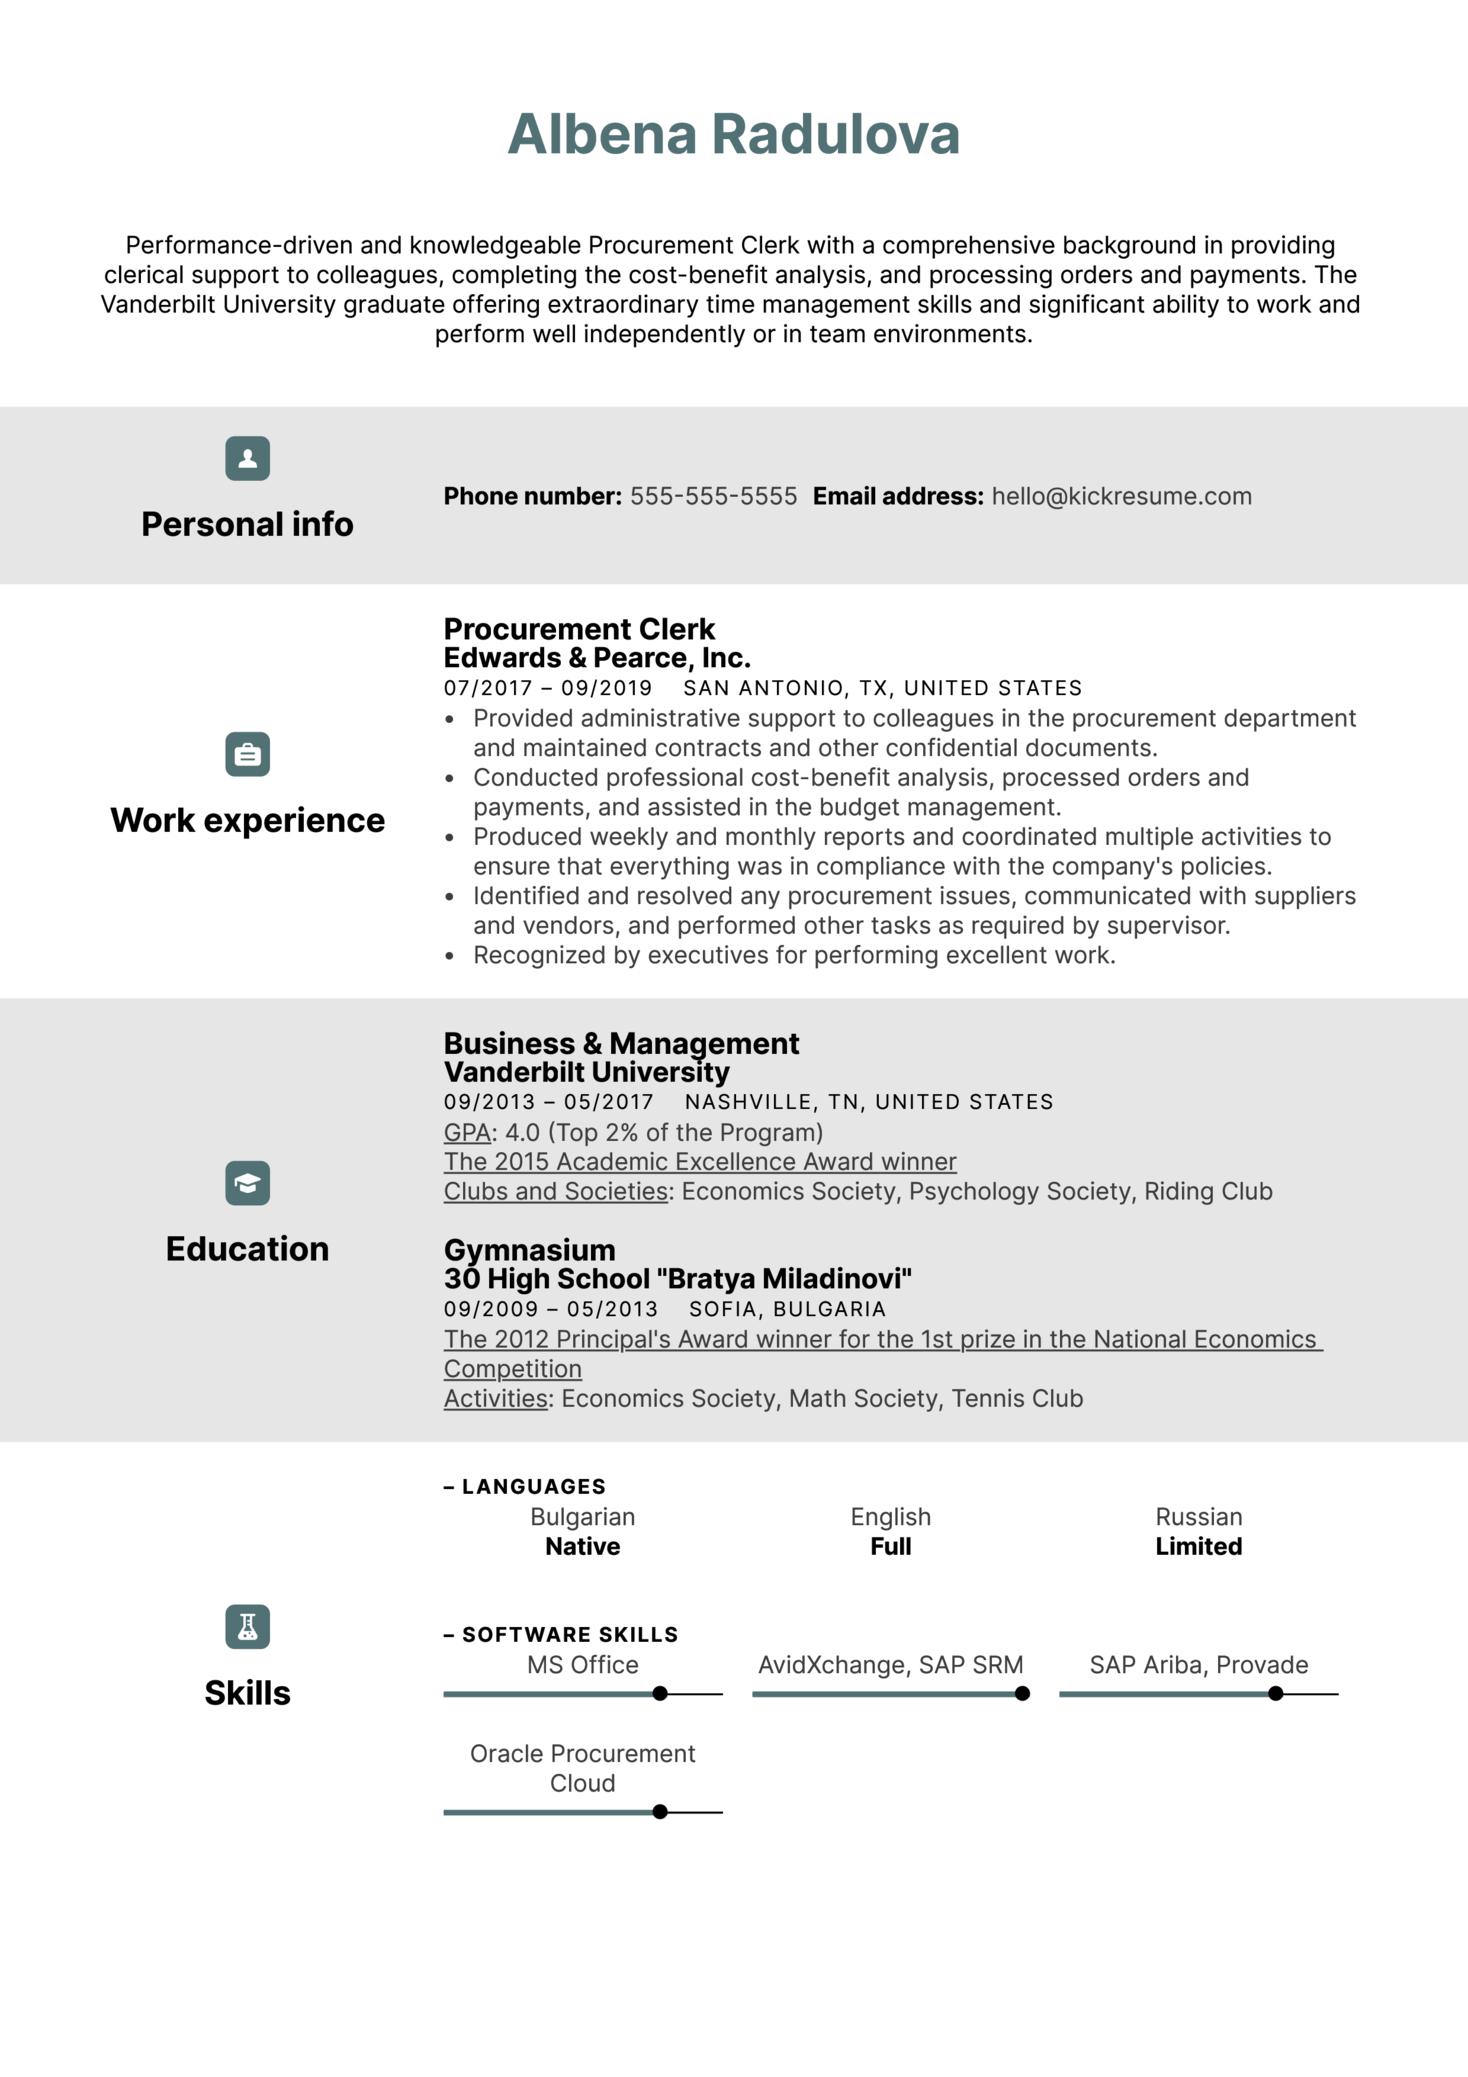 Procurement Clerk Resume Sample (Teil 1)